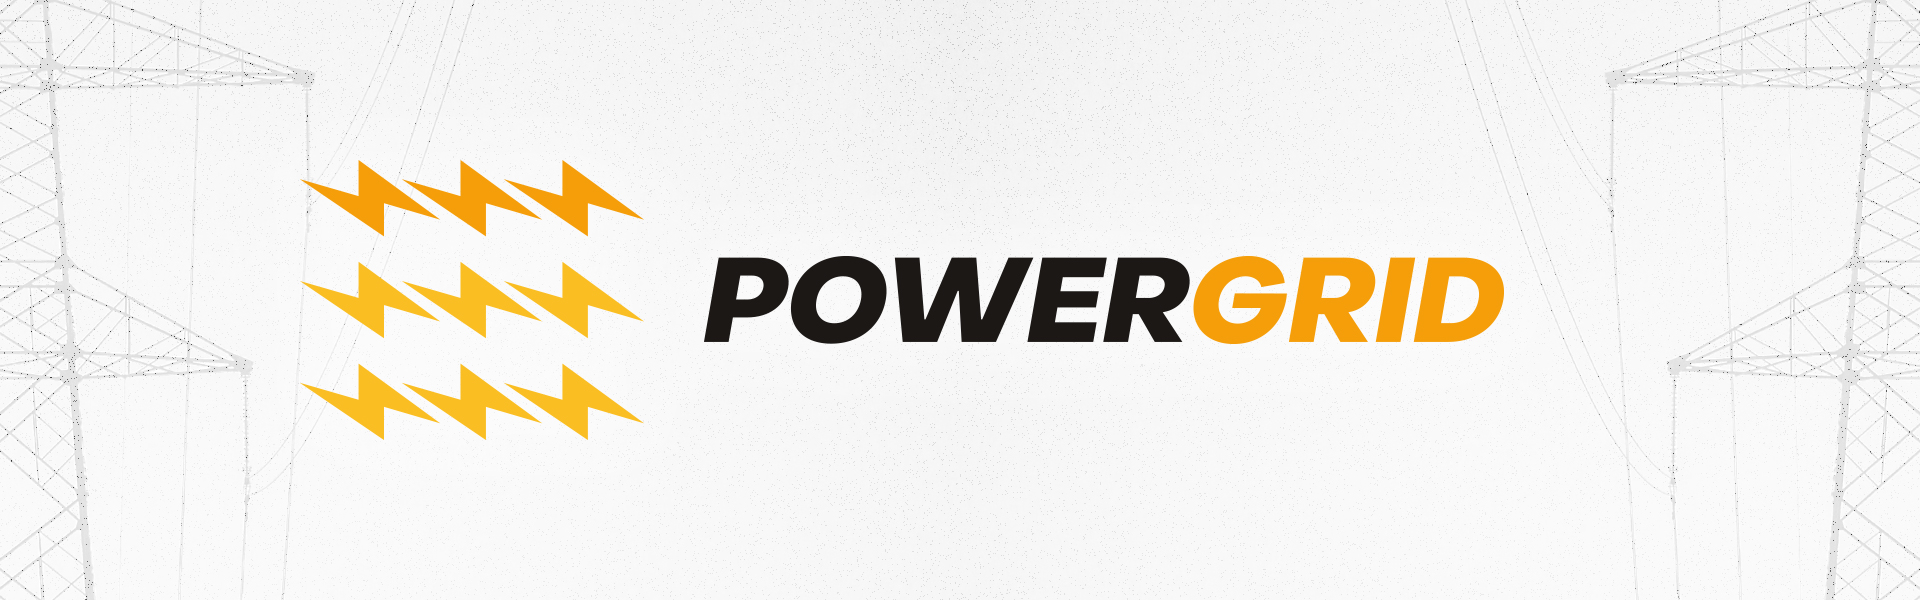 PowerGrid Header